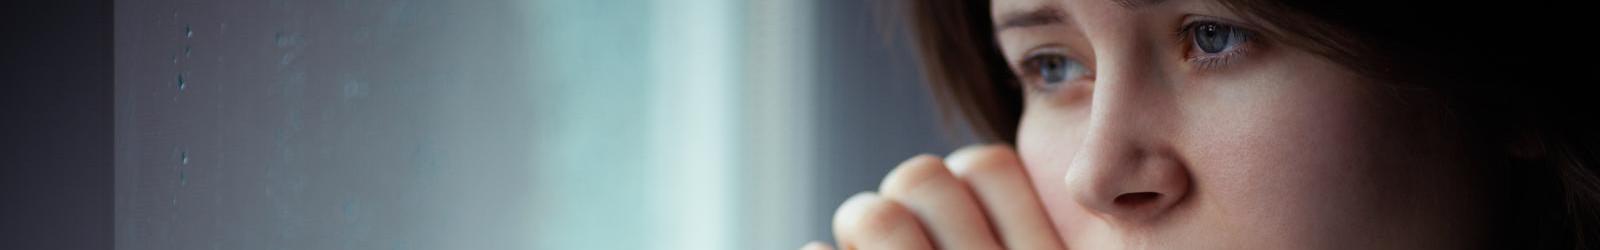 Bipolar Disorder Therapy: What Is Bipolar Disorder?